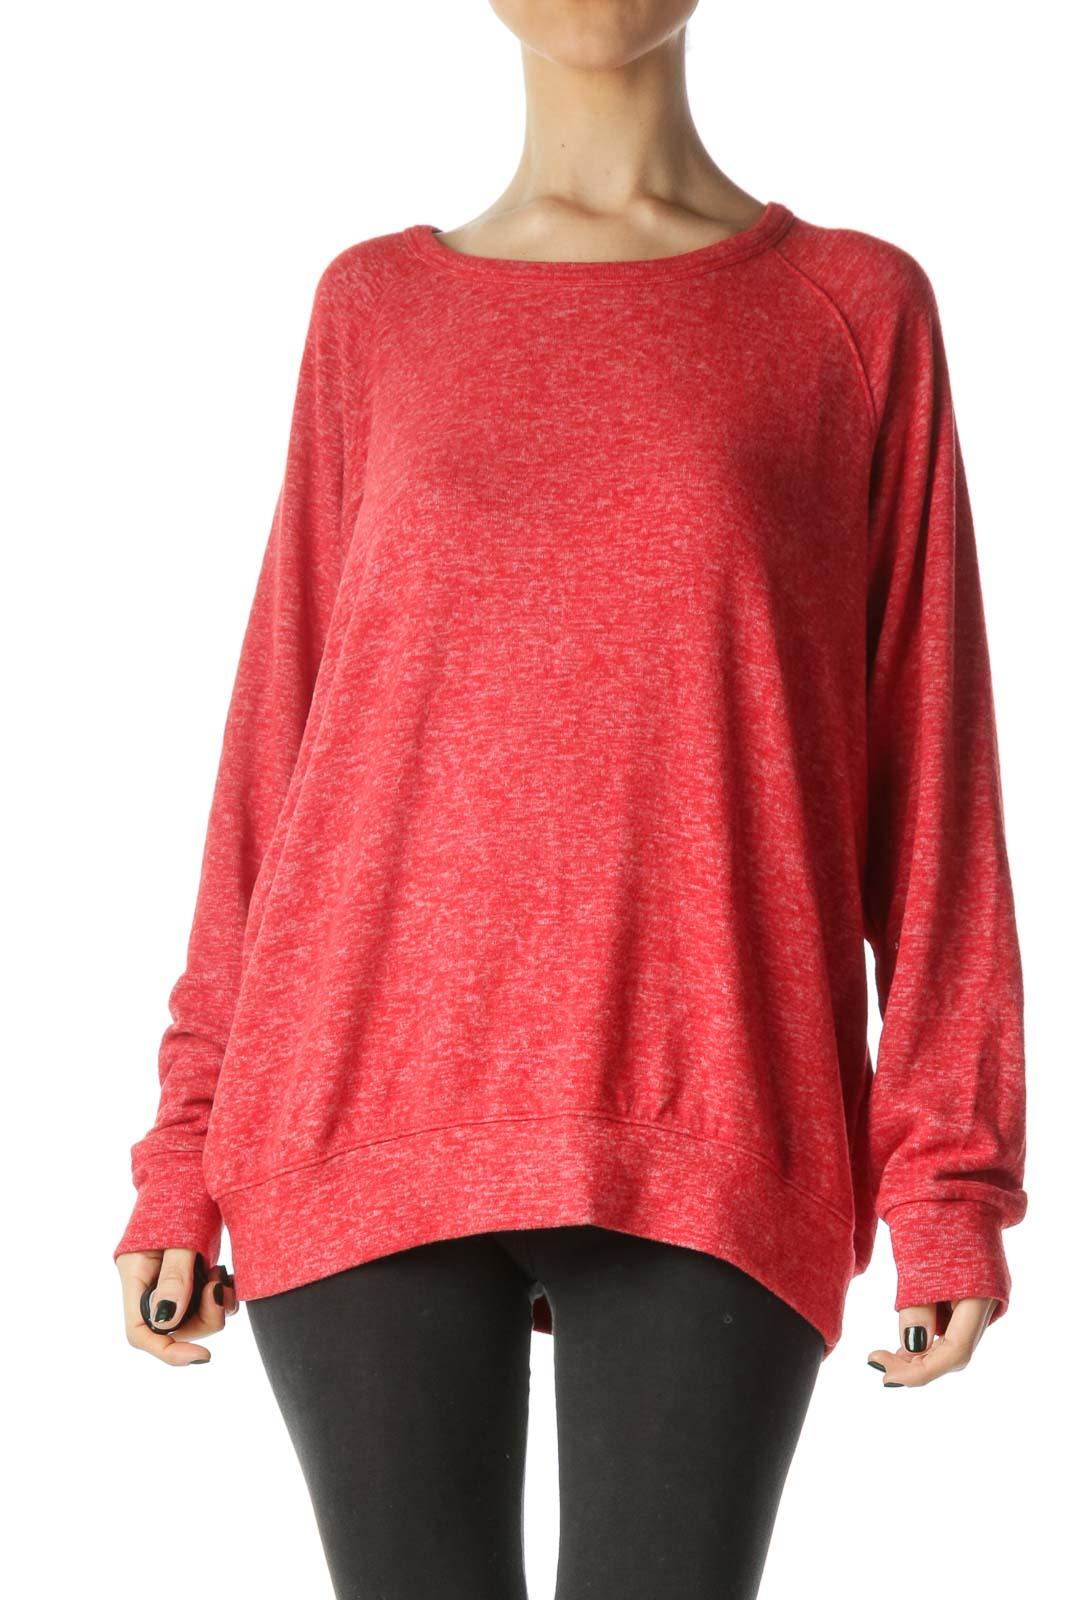 Red Mottled Pullover Front